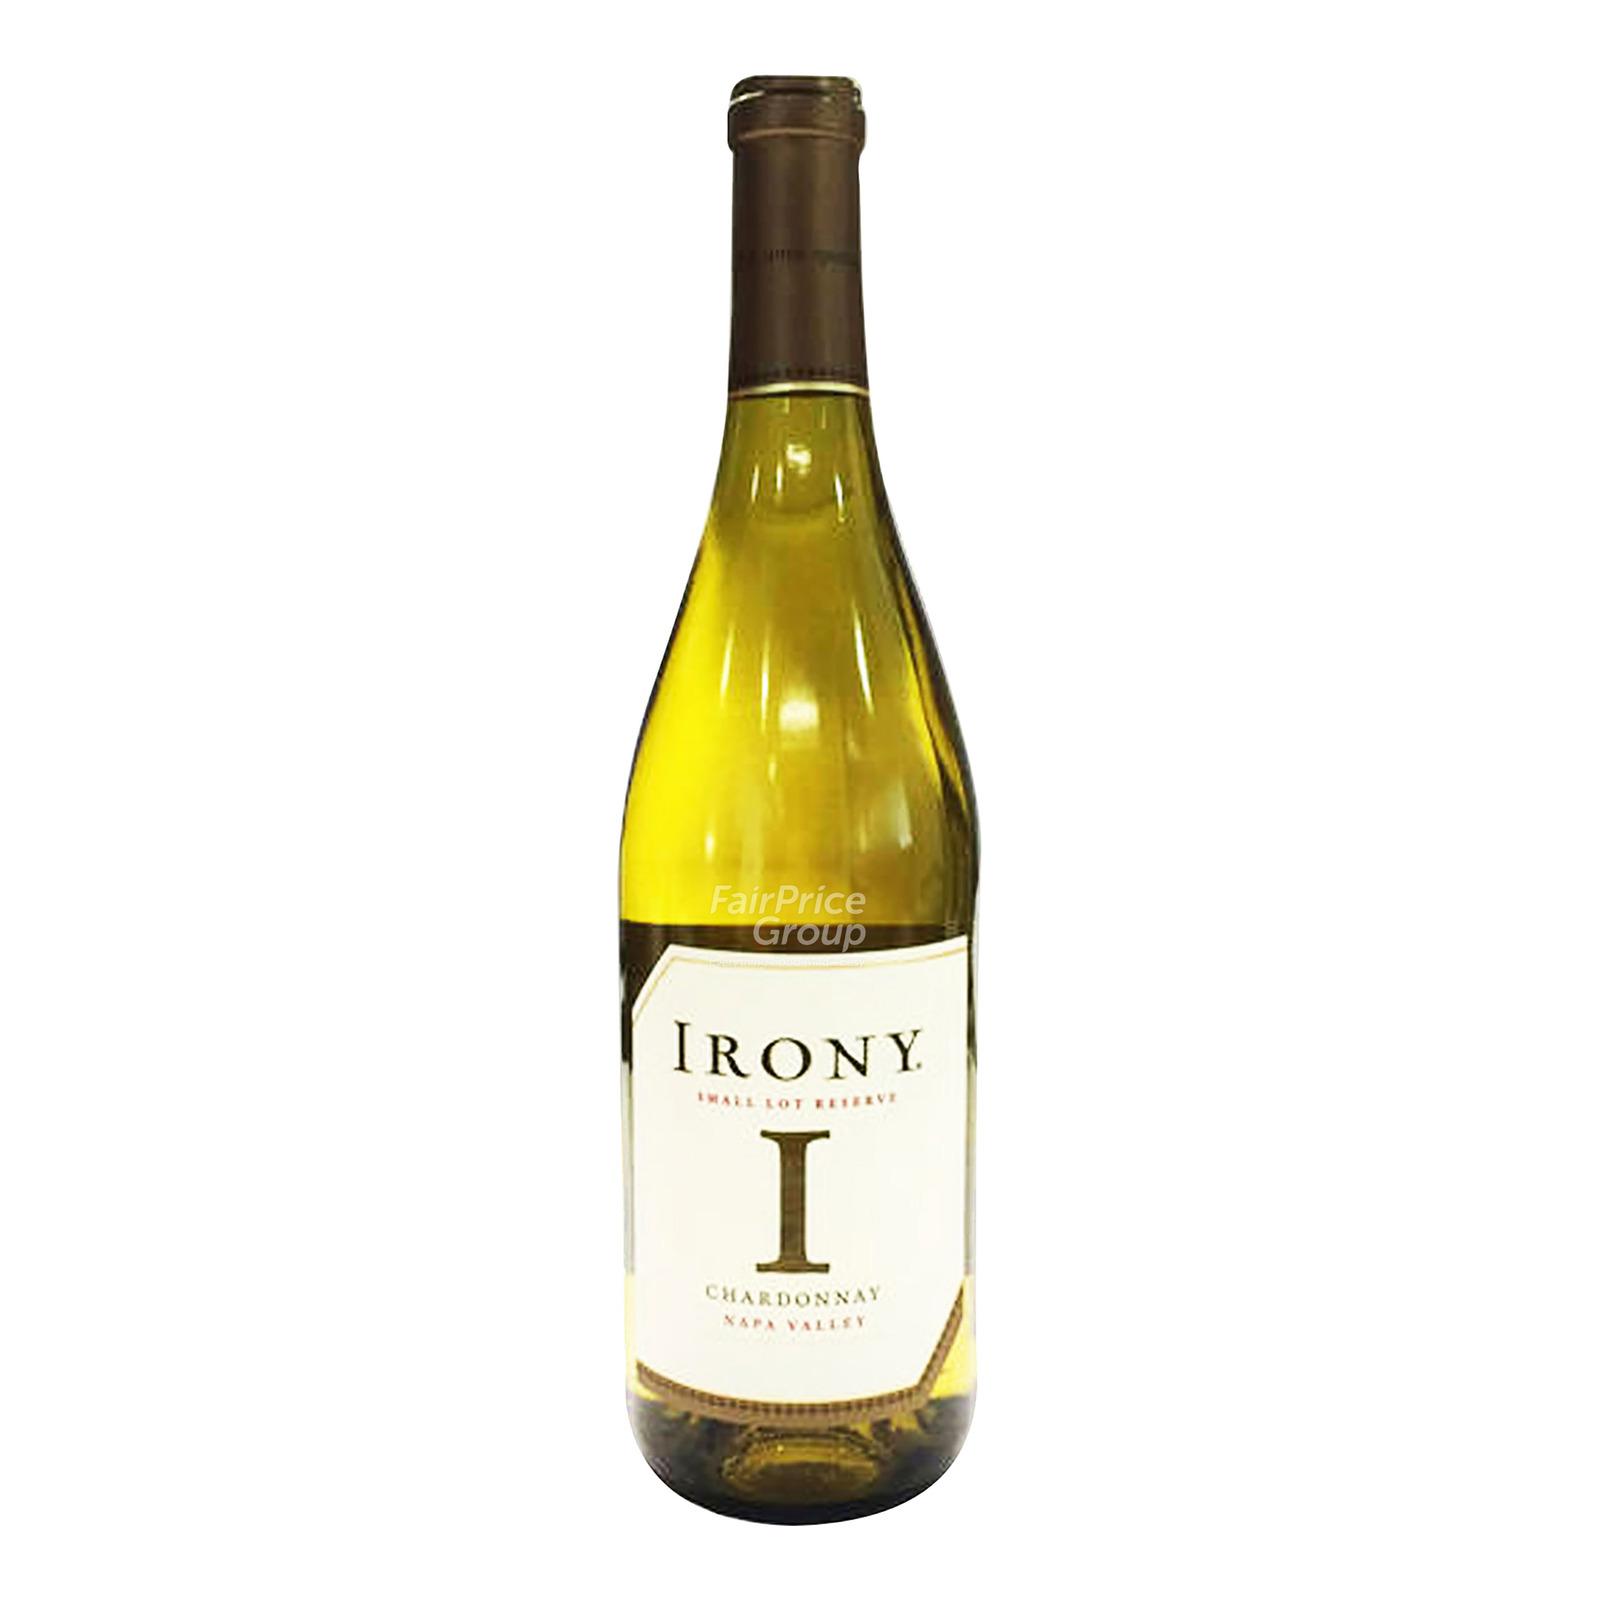 Irony Small Lot Reserve White Wine - Chardonnay